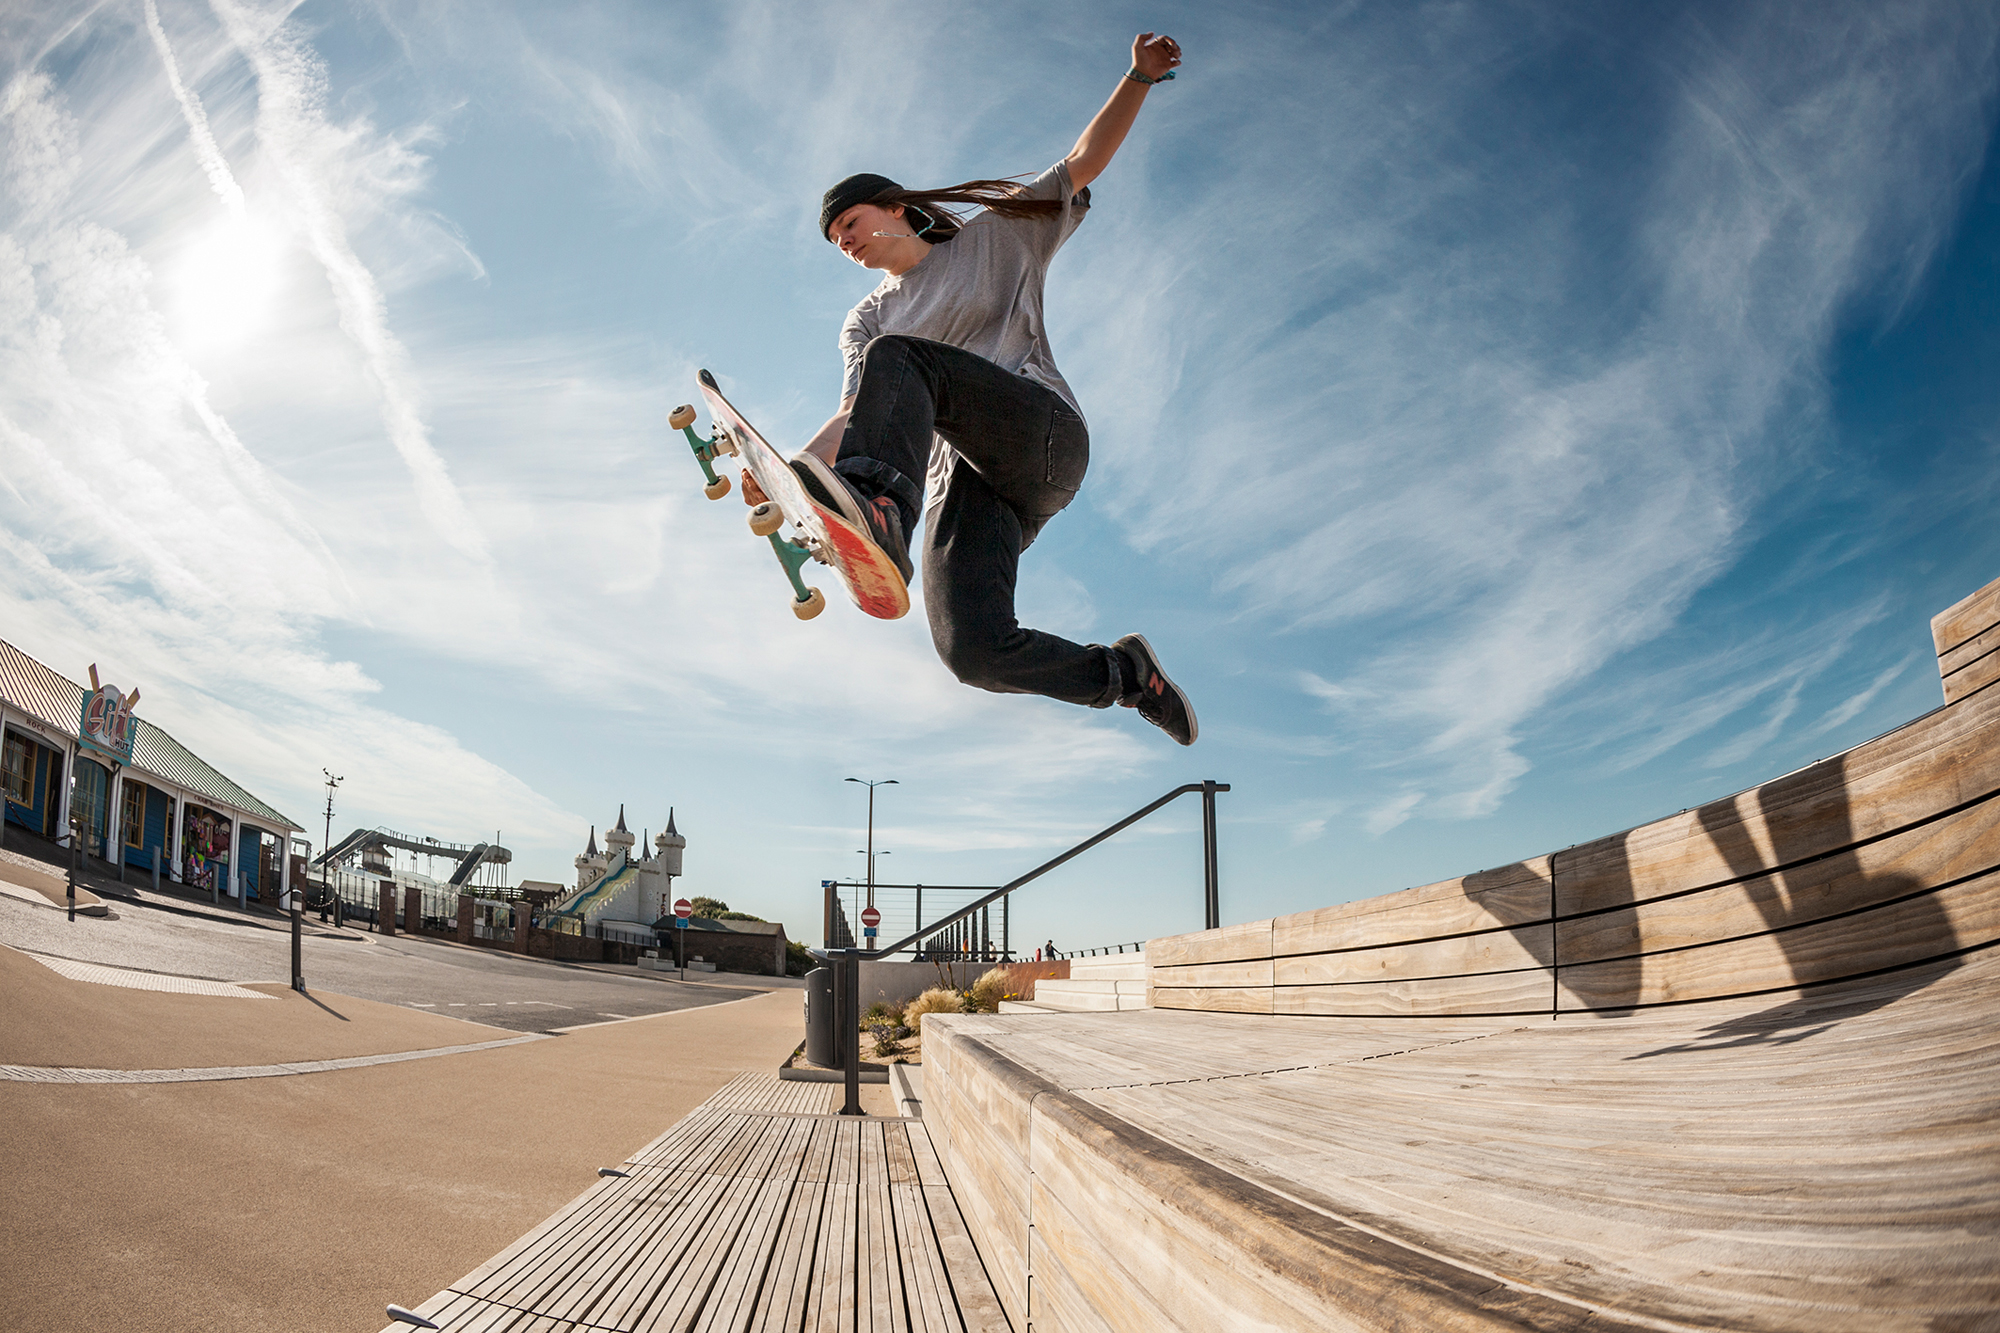 Scene Stealers | Why Women's Skateboarding is More...